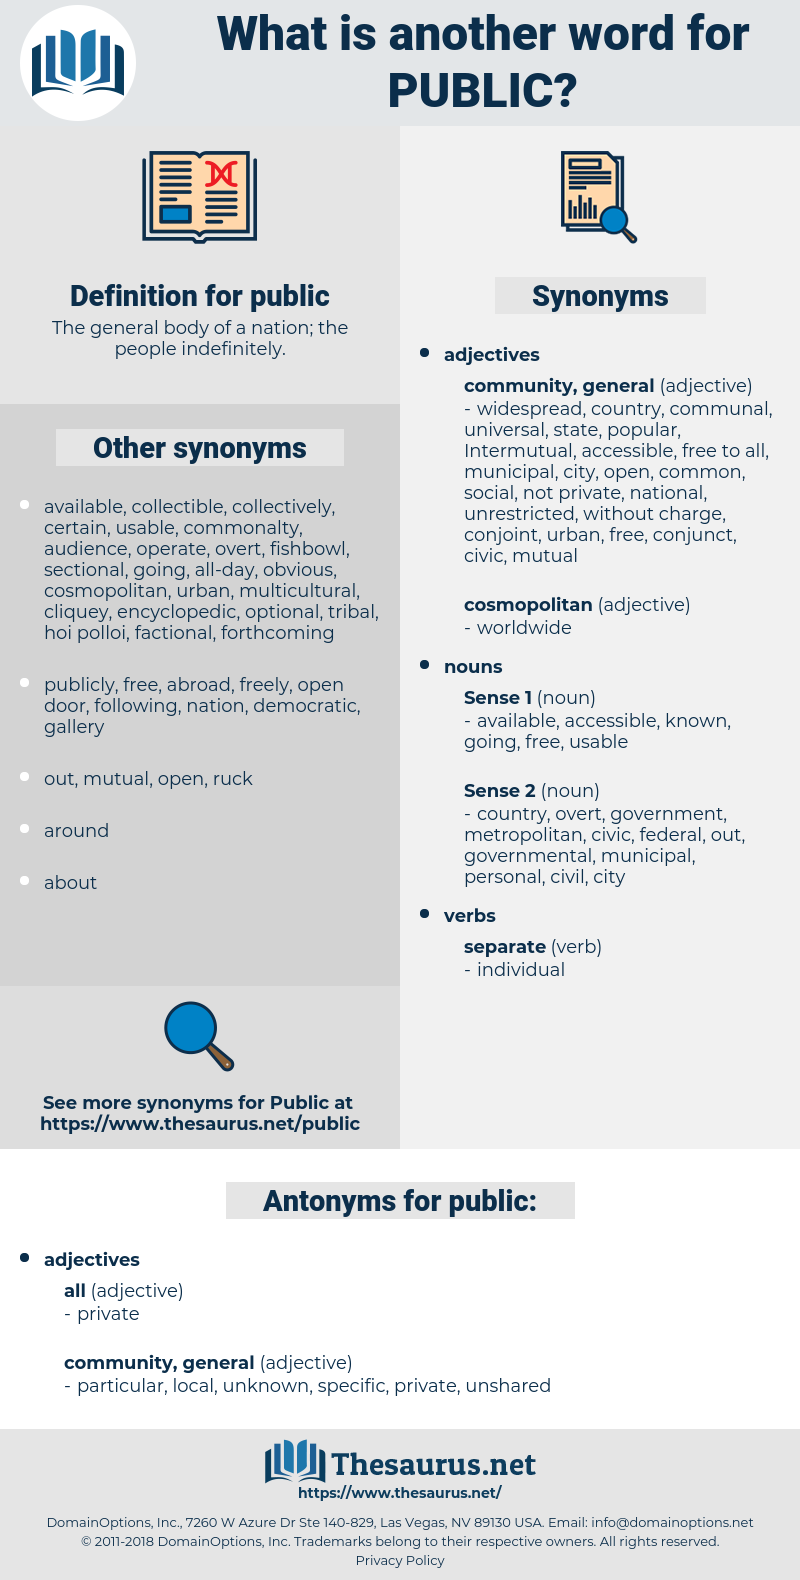 public, synonym public, another word for public, words like public, thesaurus public